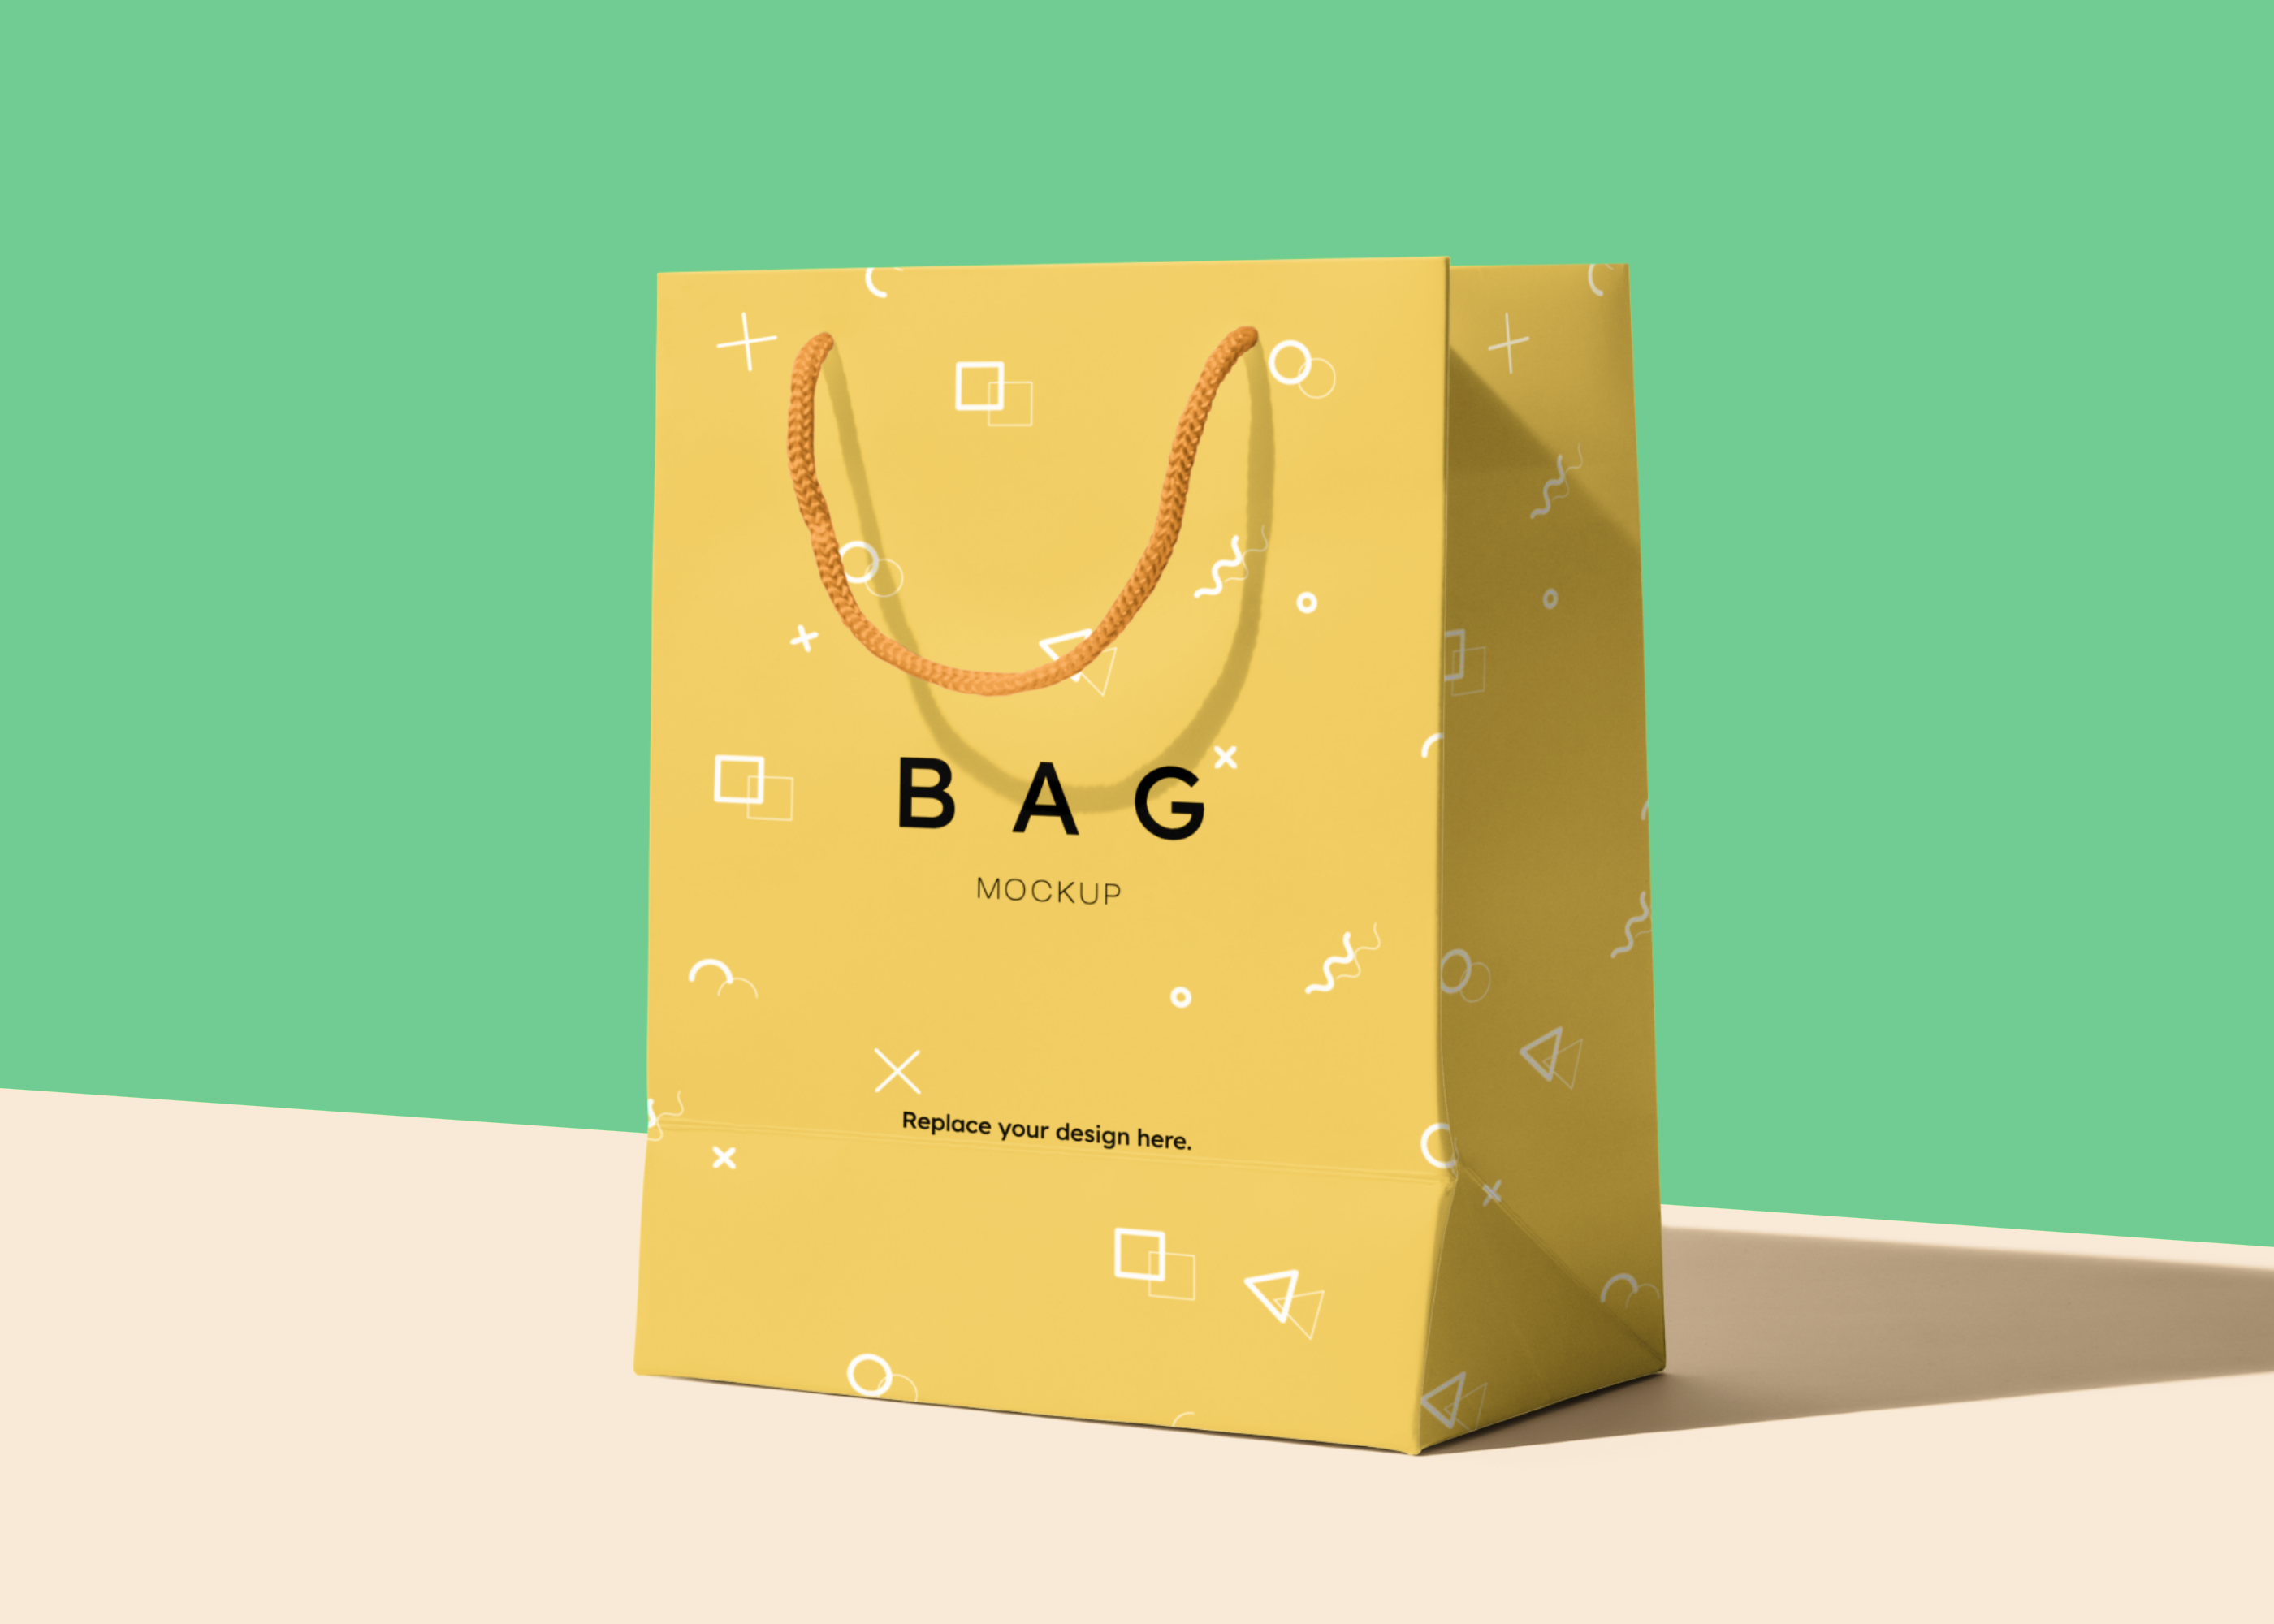 Download Paper Bag Free Psd Mockup Scene Bag Mockup Mockup Mockup Free Psd